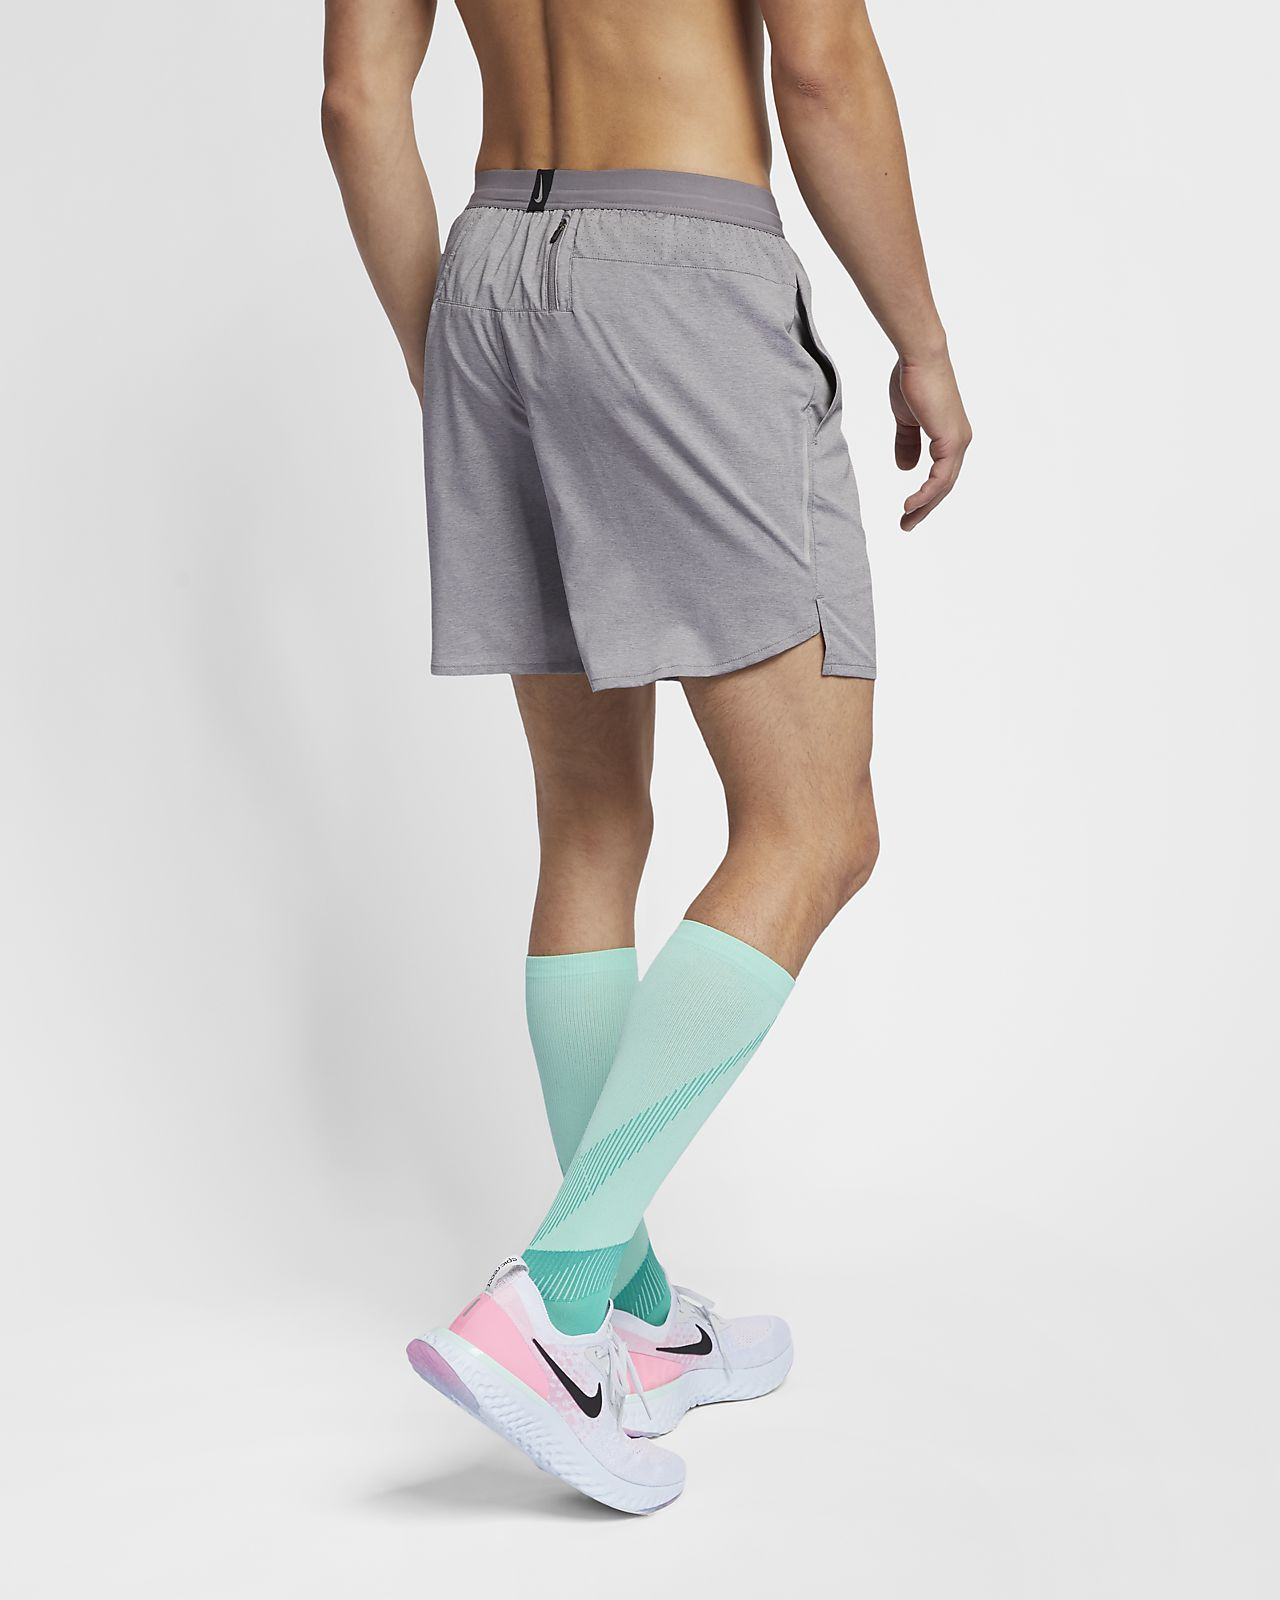 nike 6 inch shorts